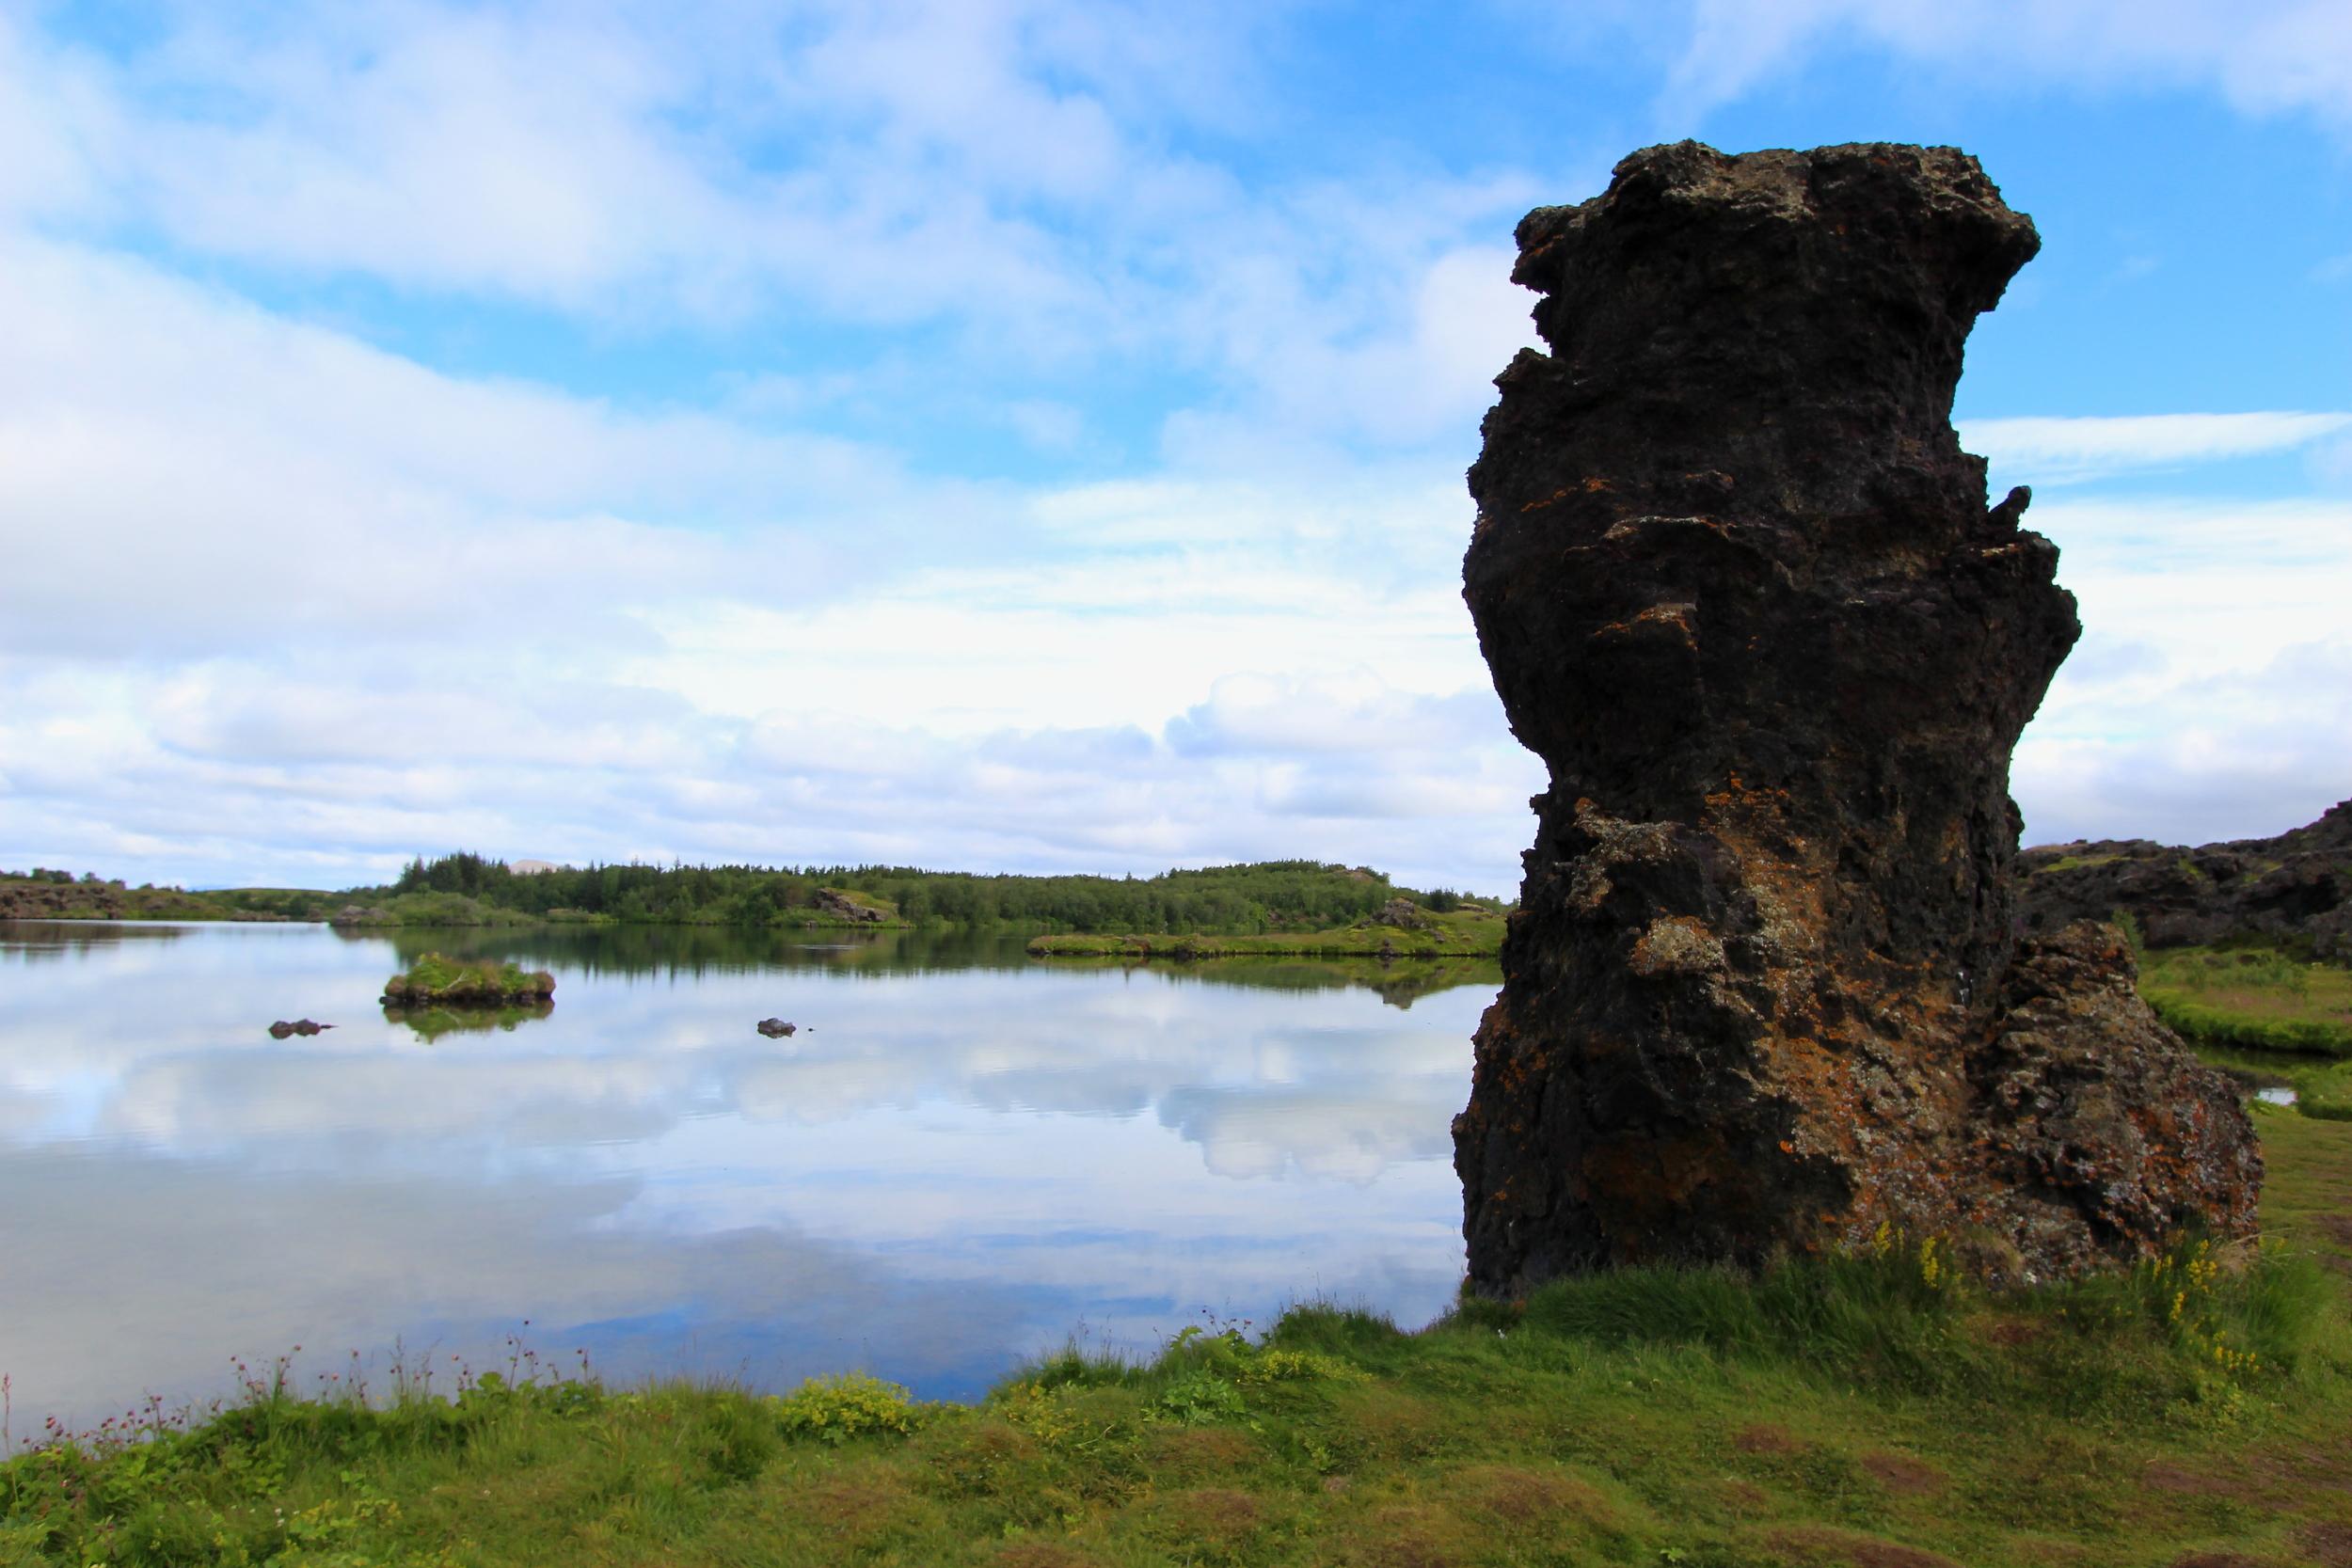 Mývatn - A Lake Between Volcanoes